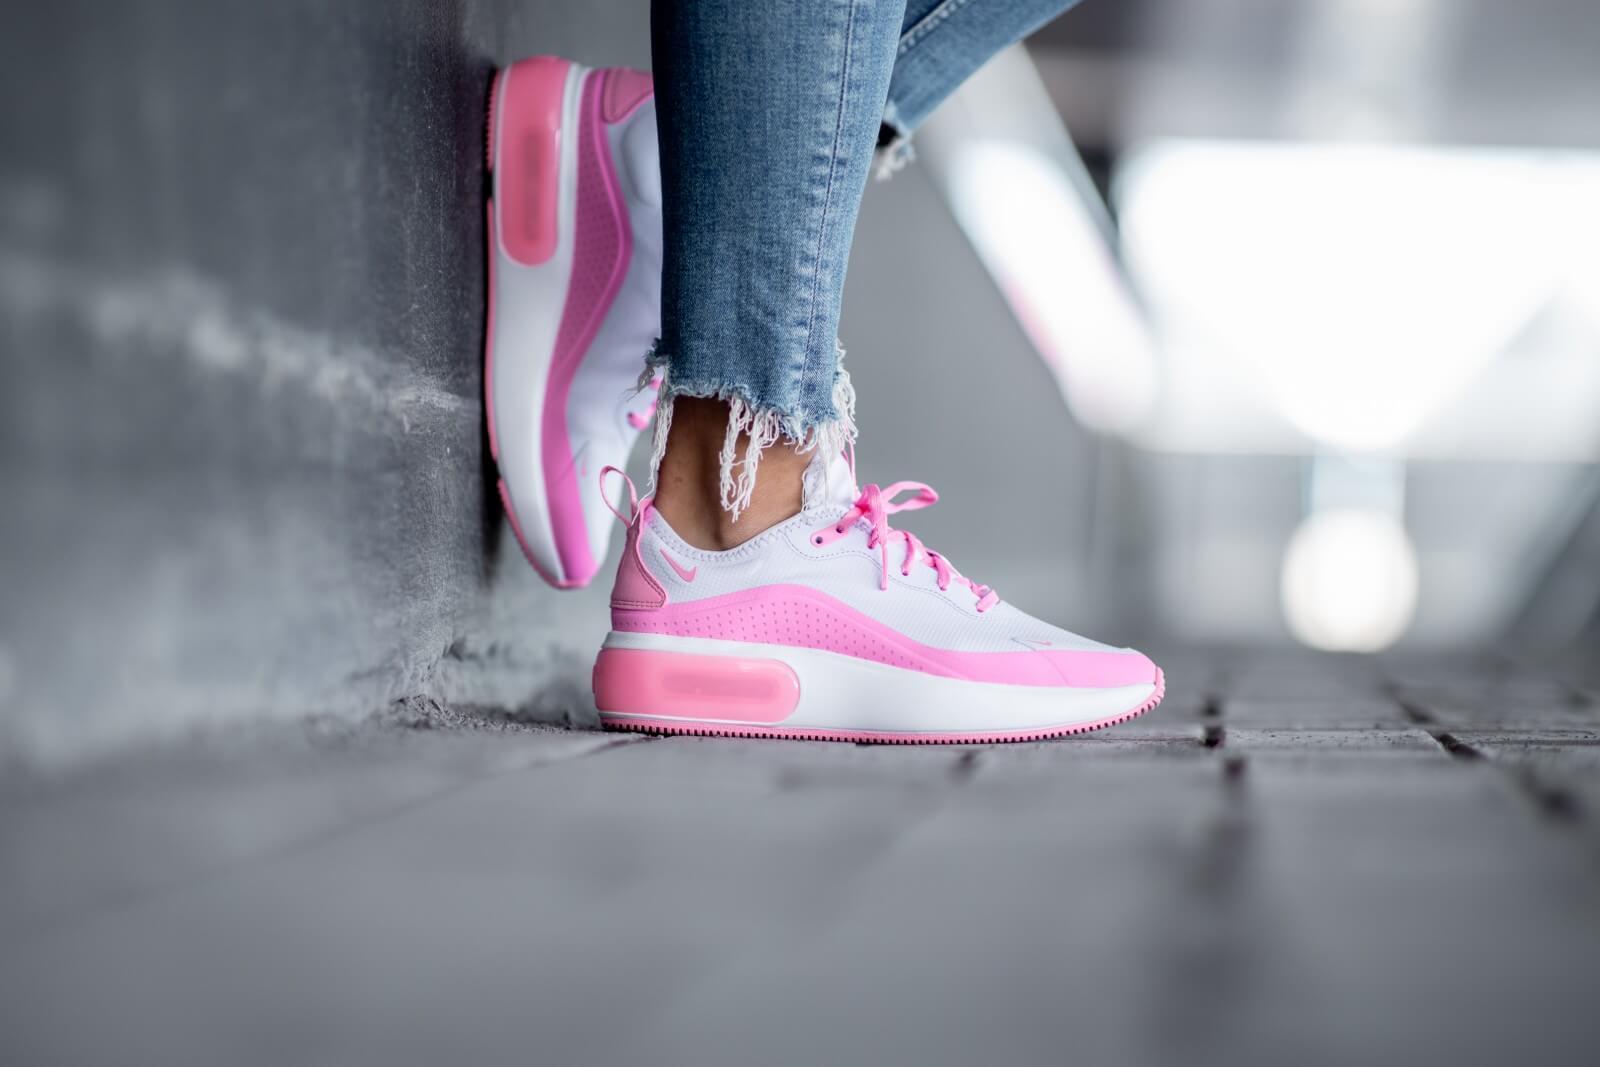 Nike Air Max DIA Amethyst Tint/Psychic